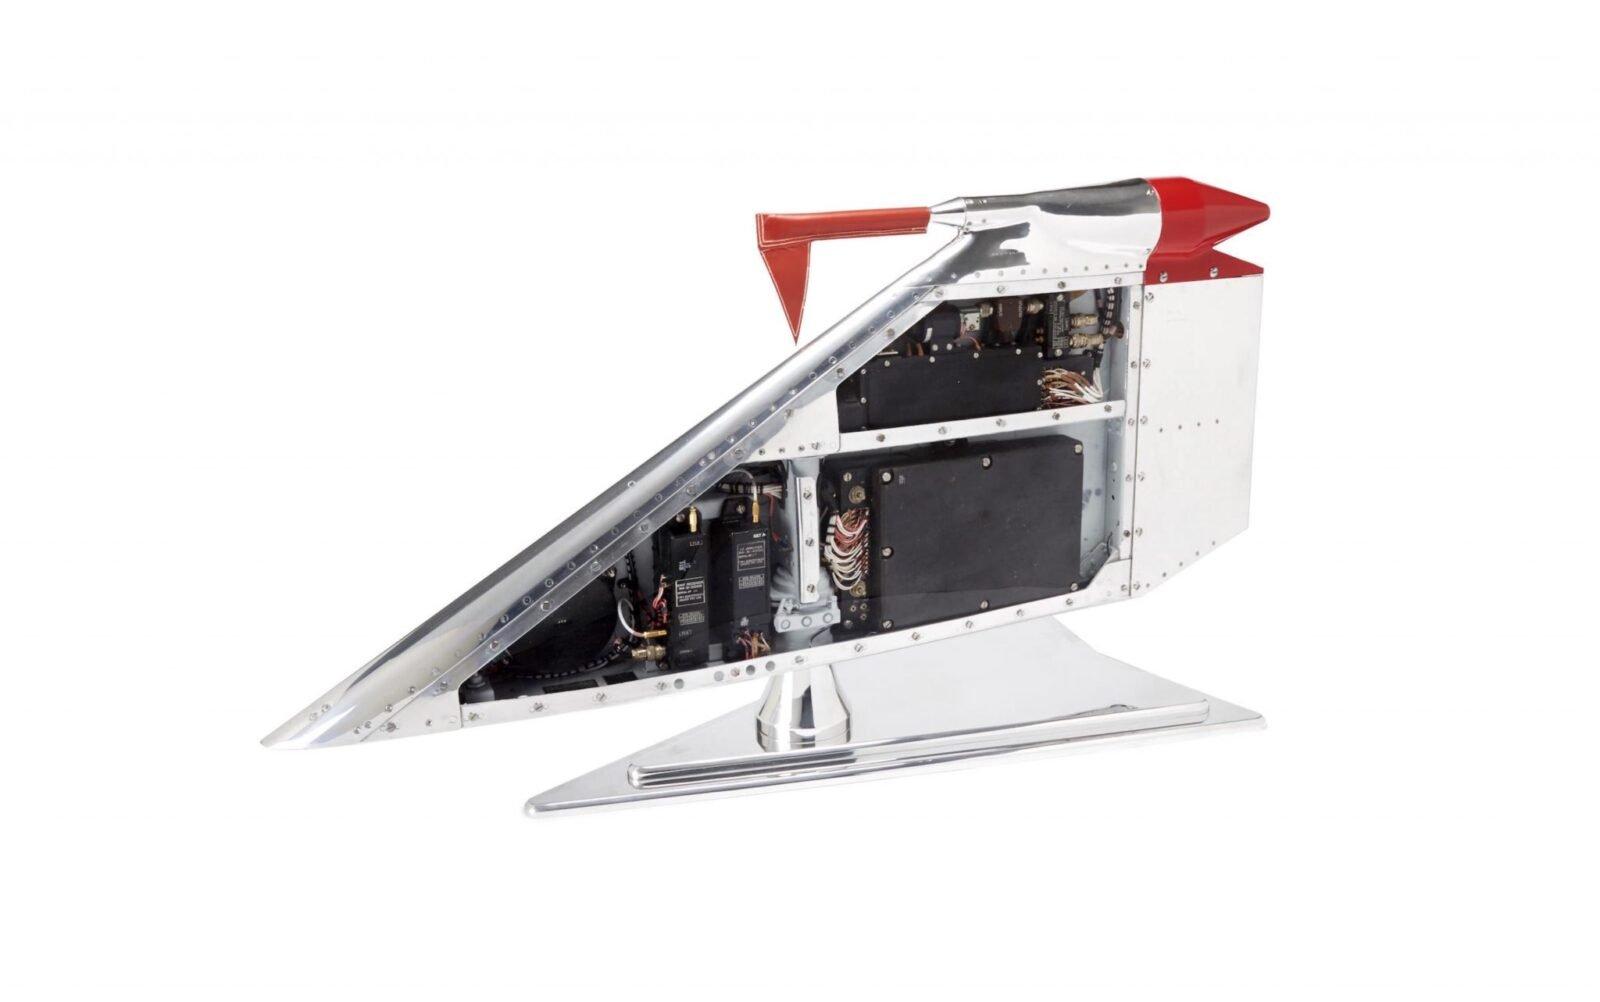 Ikara Anti Submarine Tail Fin 1600x1002 - Ikara Anti-Submarine Tail Fin